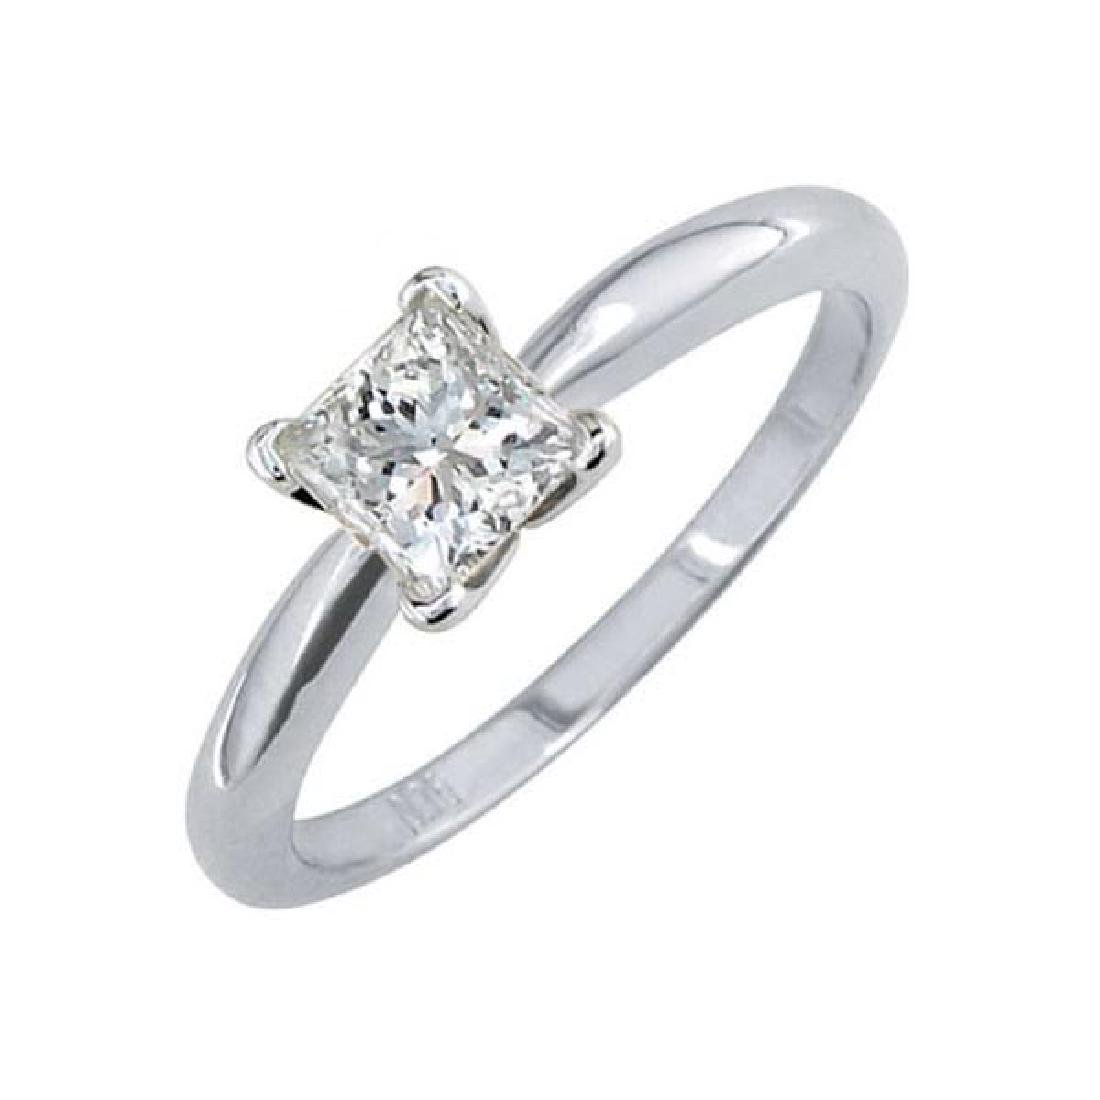 Certified 1.26 CTW Princess Diamond Solitaire 14k Ring